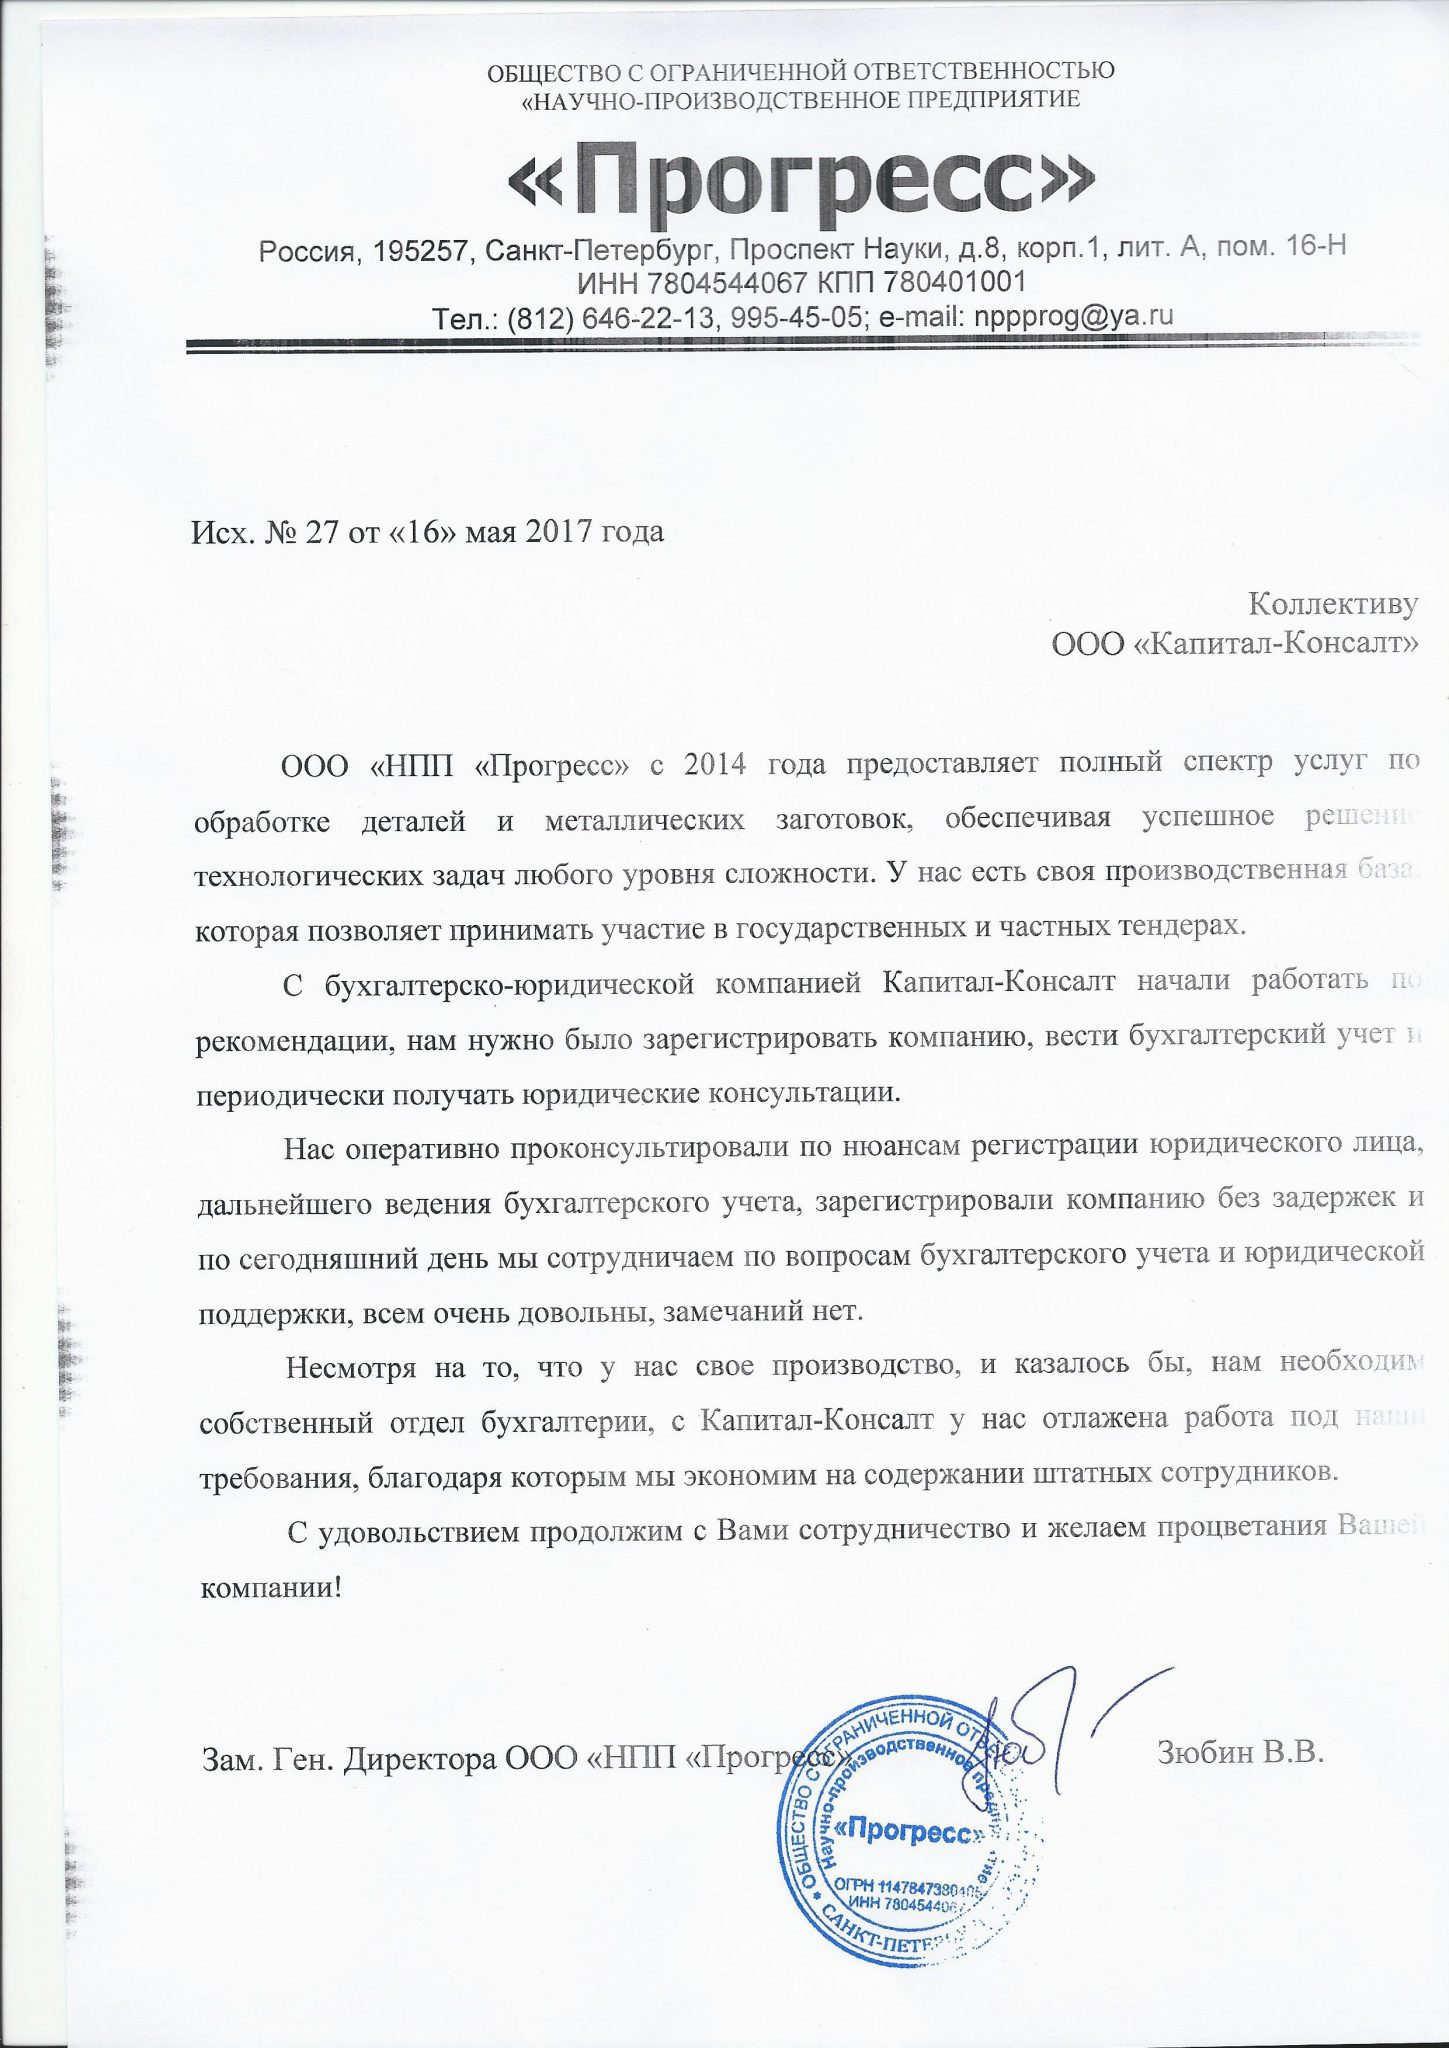 НПП-Прогресс-ООО